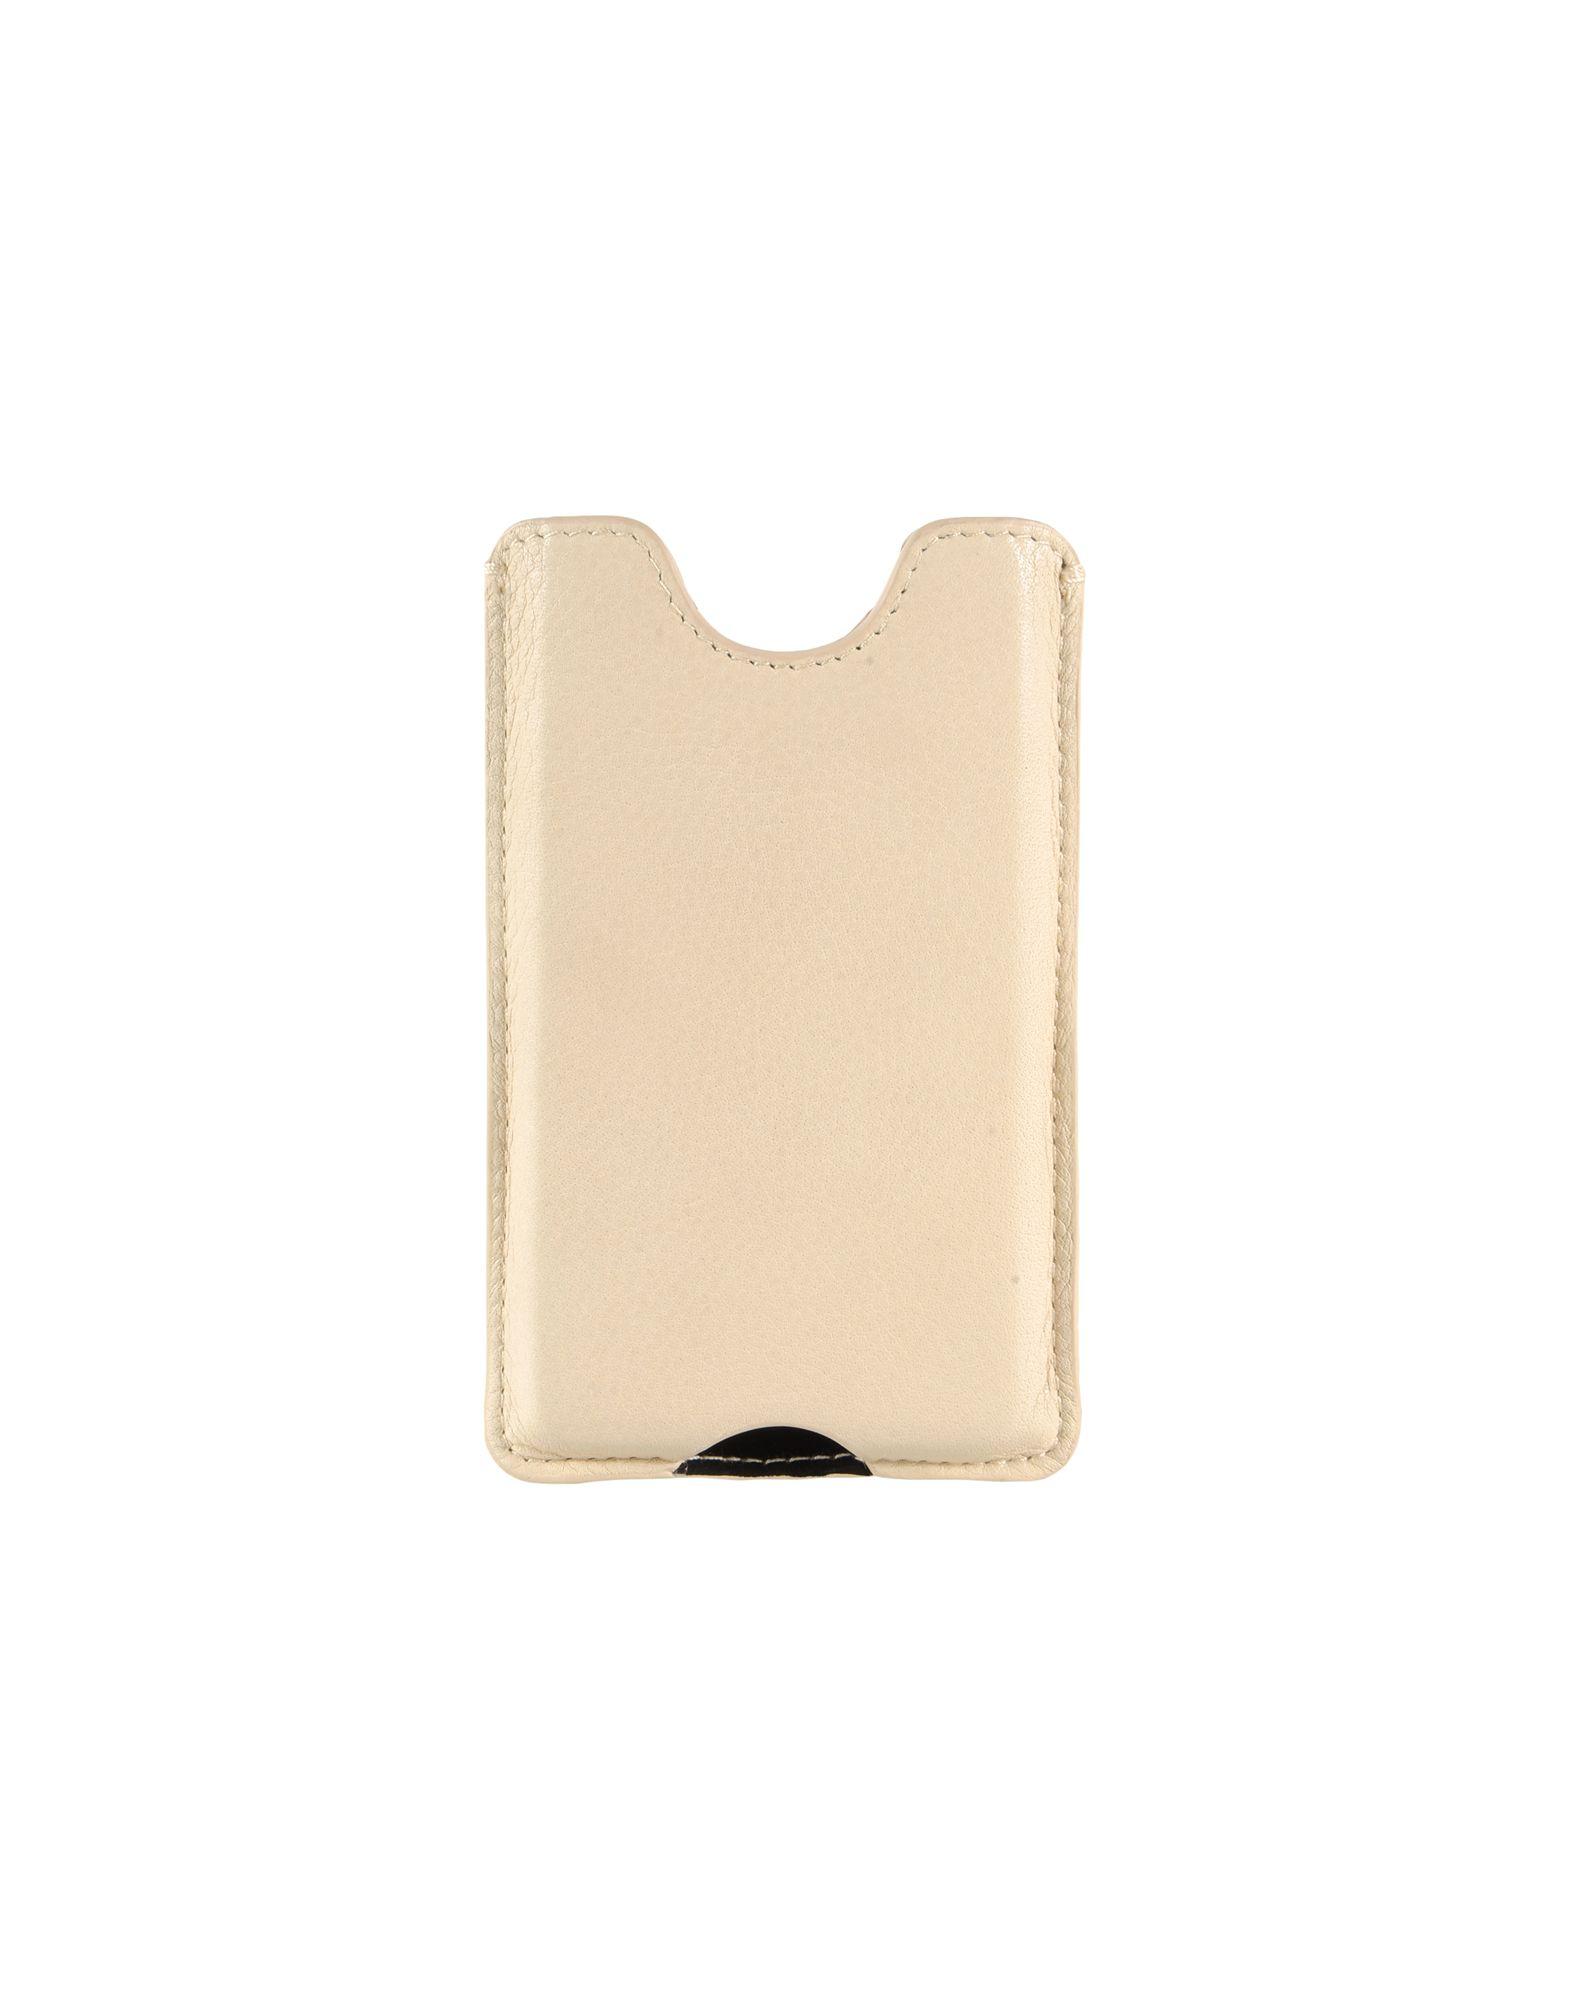 Giorgio Fedon 1919 Mobile Phone Cases